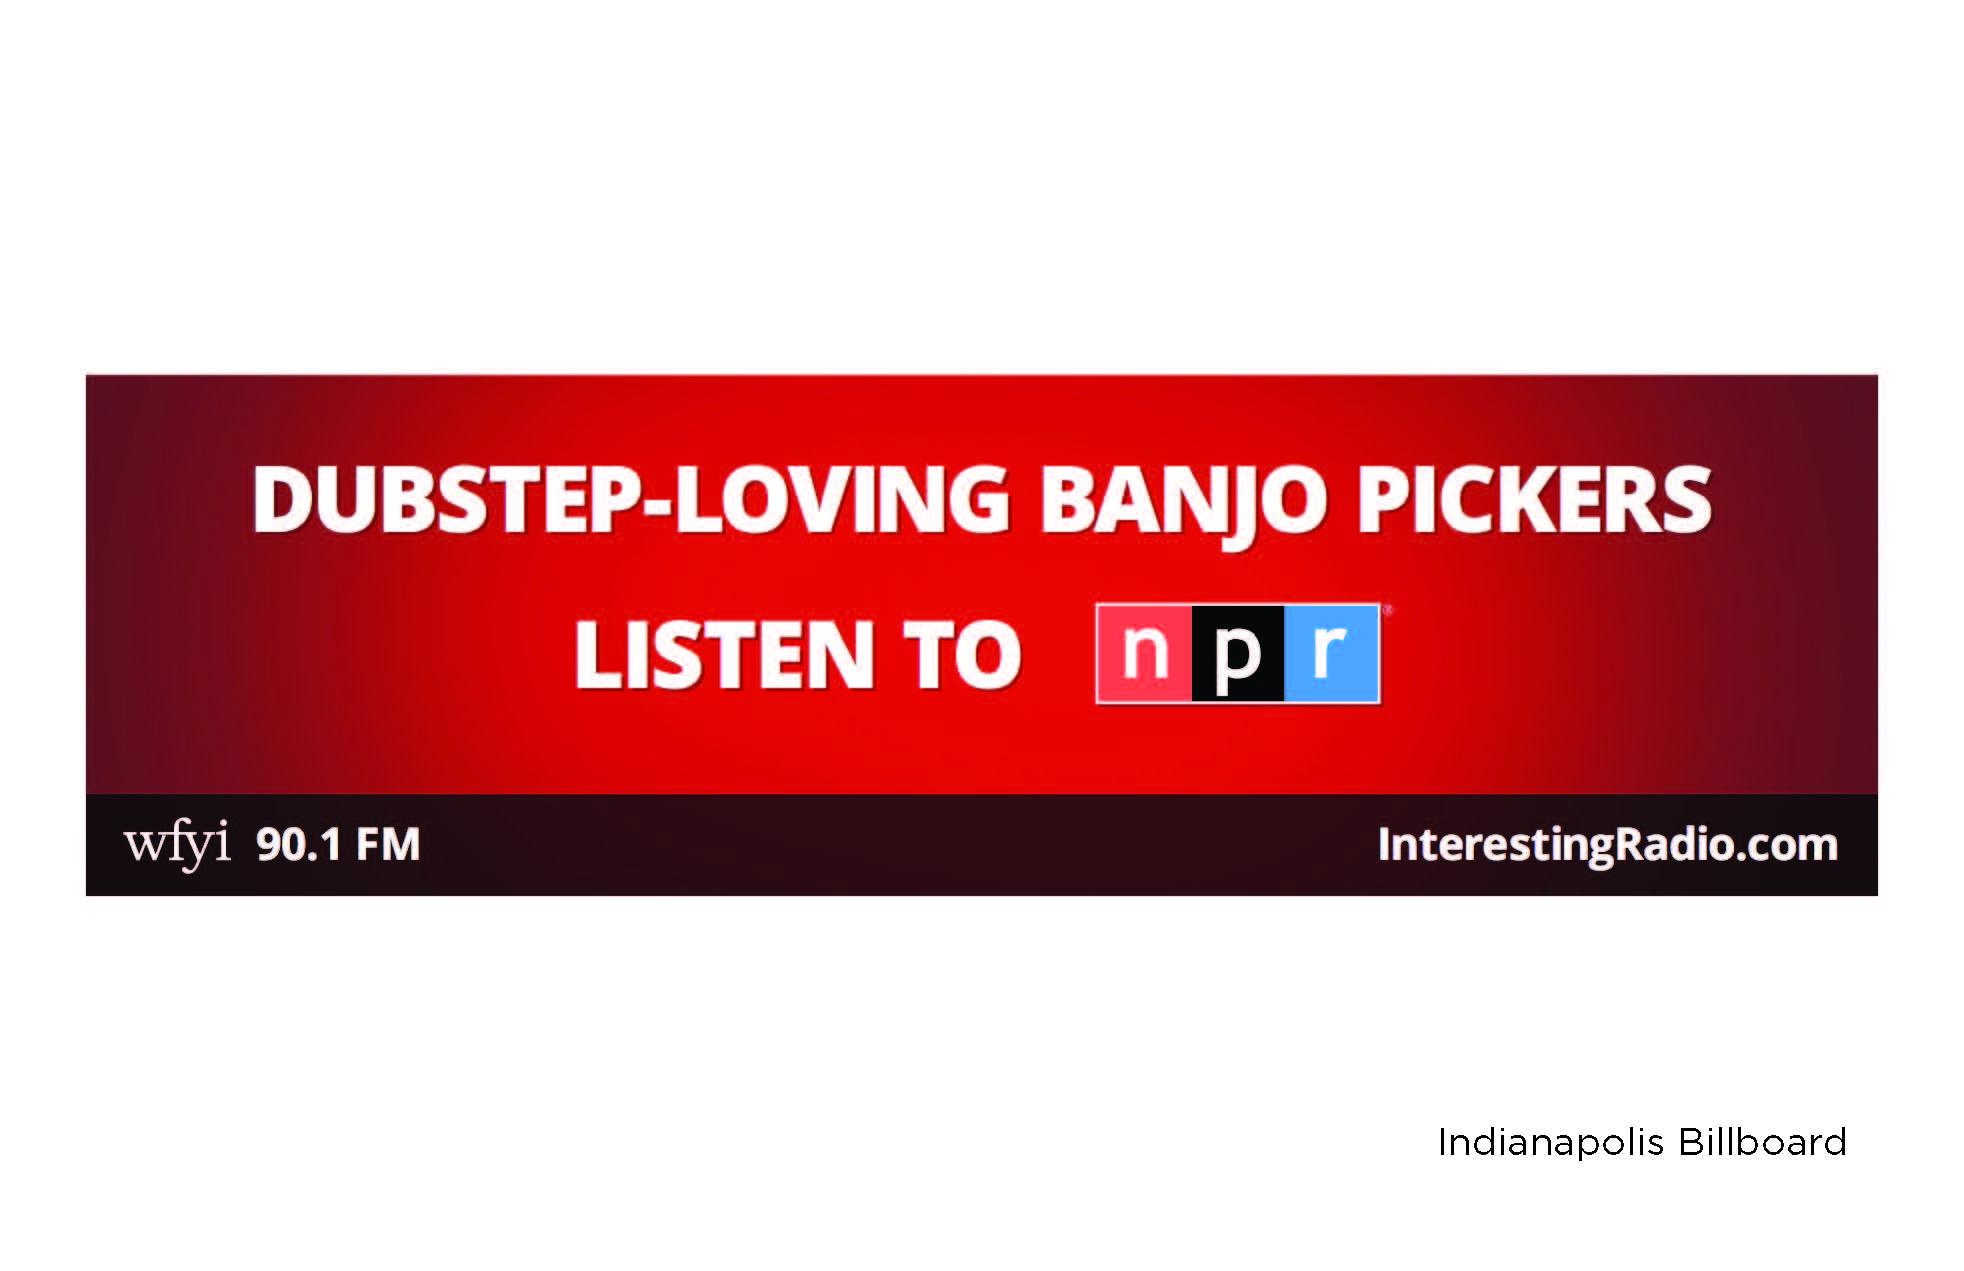 WFYI 90.1 FM Indianapolis Billboard